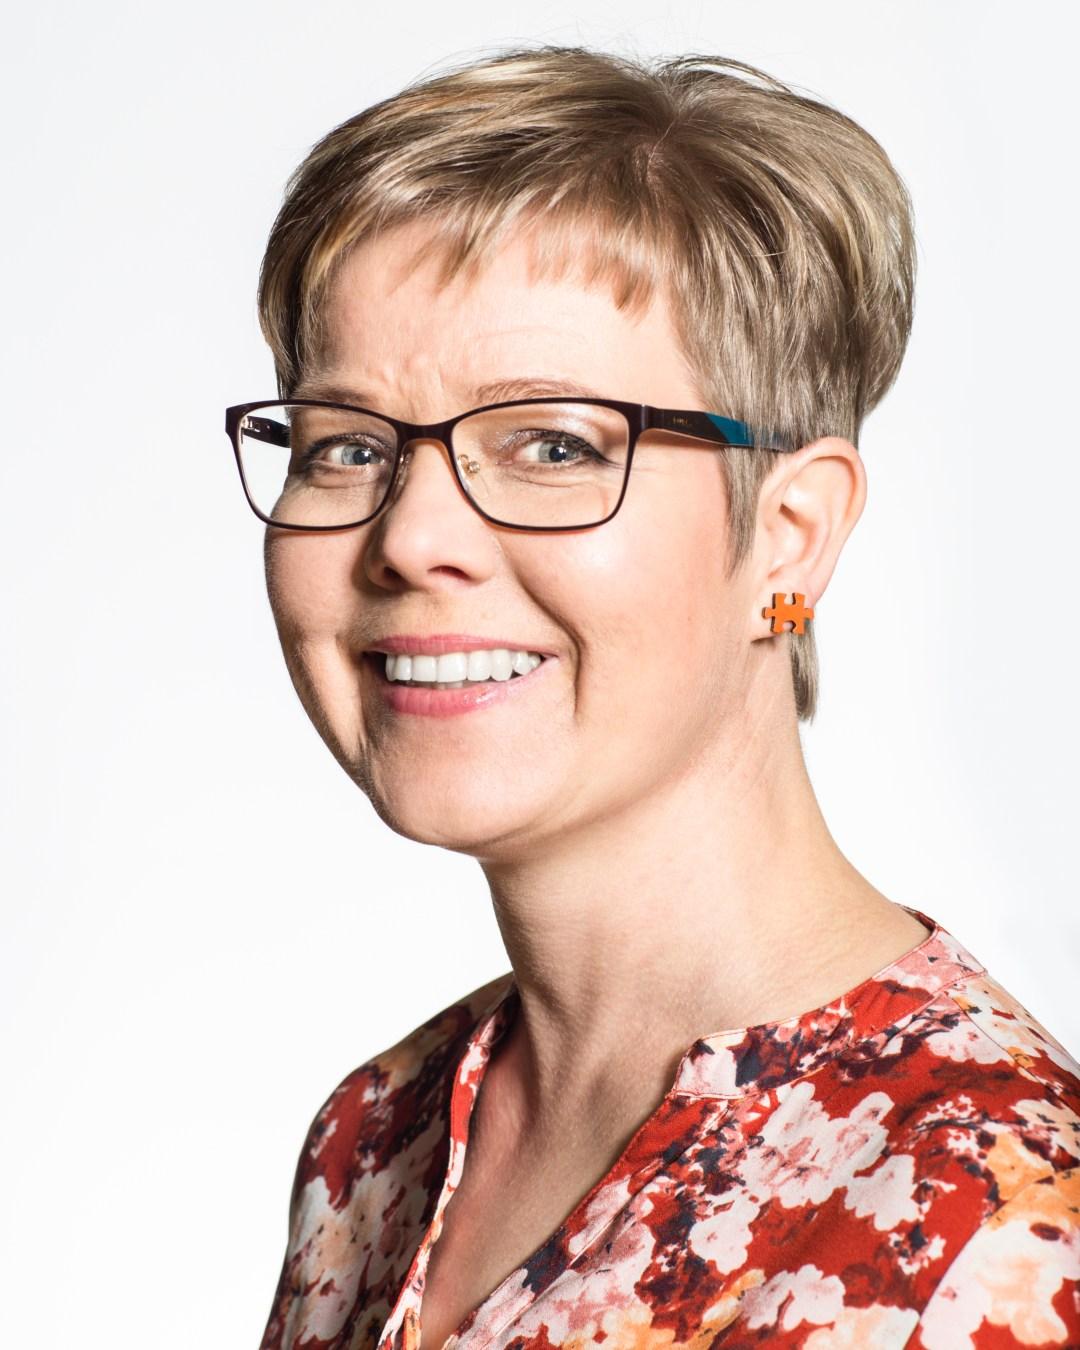 Krista Mikkonen, 45